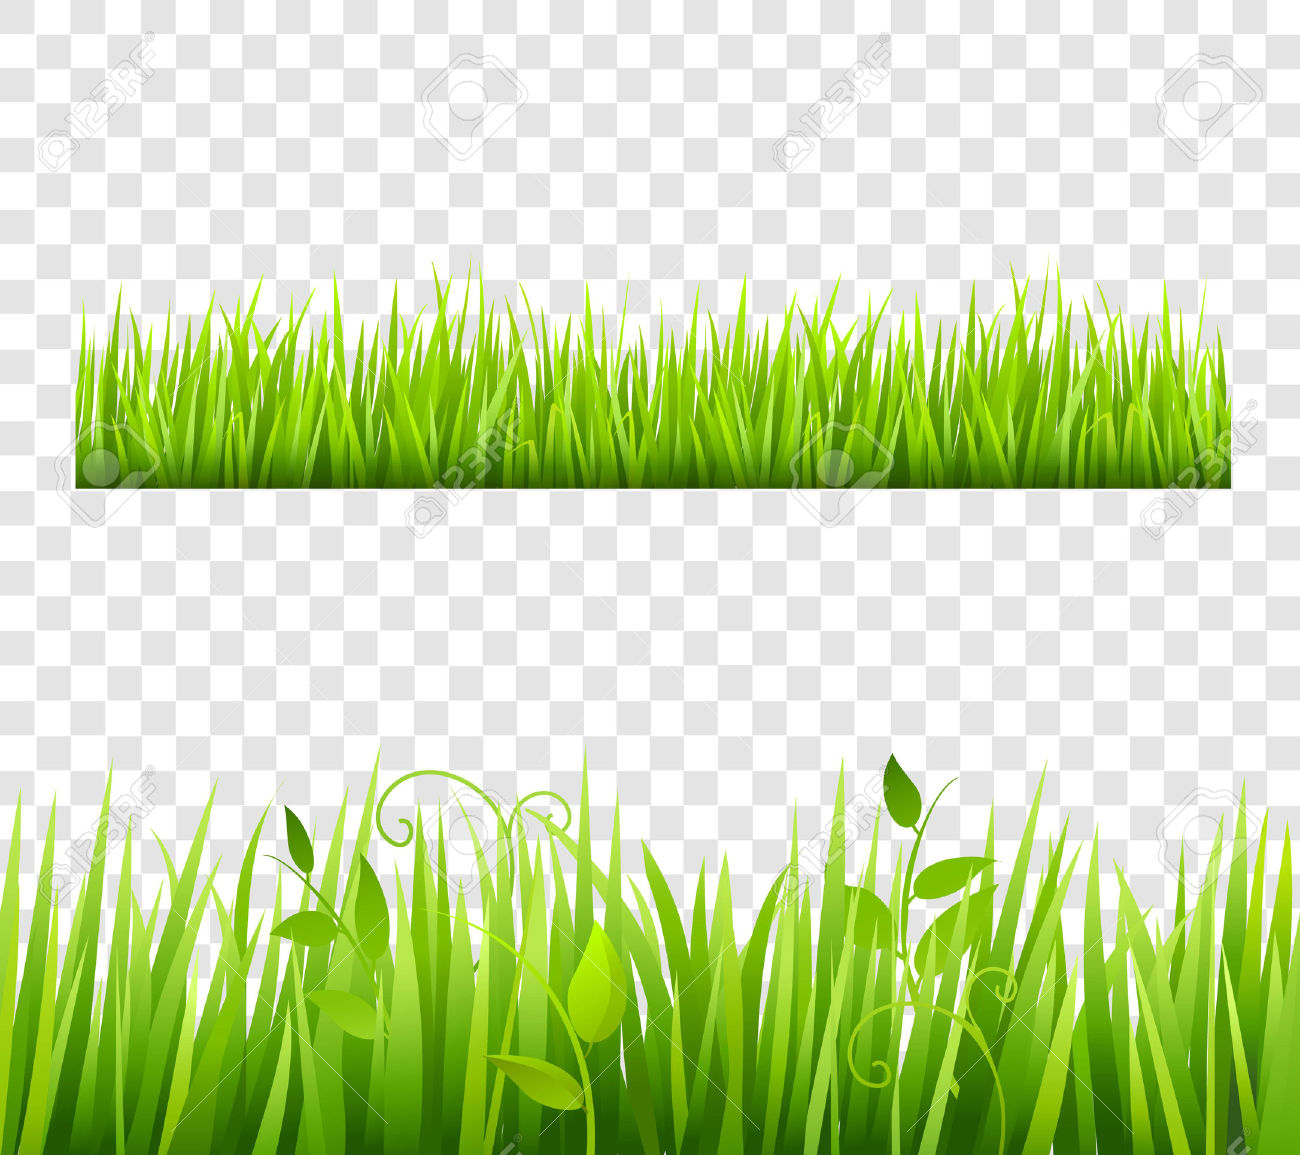 Sea Grass clipart grass border #10